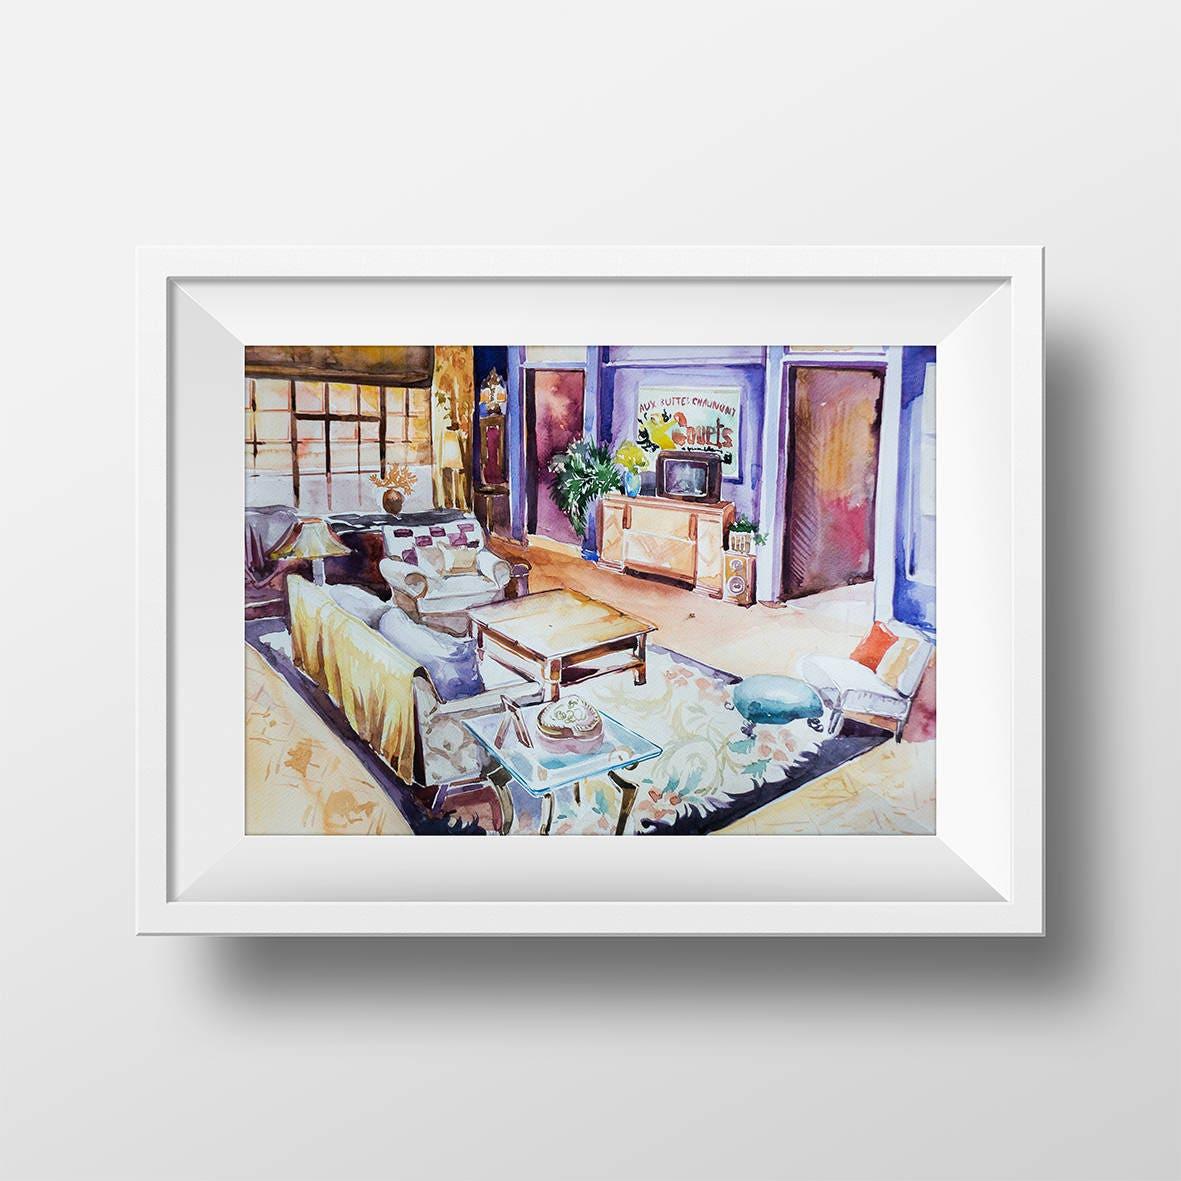 Wandkunst Freunde TV-Show Monicas Wohnzimmer Aquarell Druck